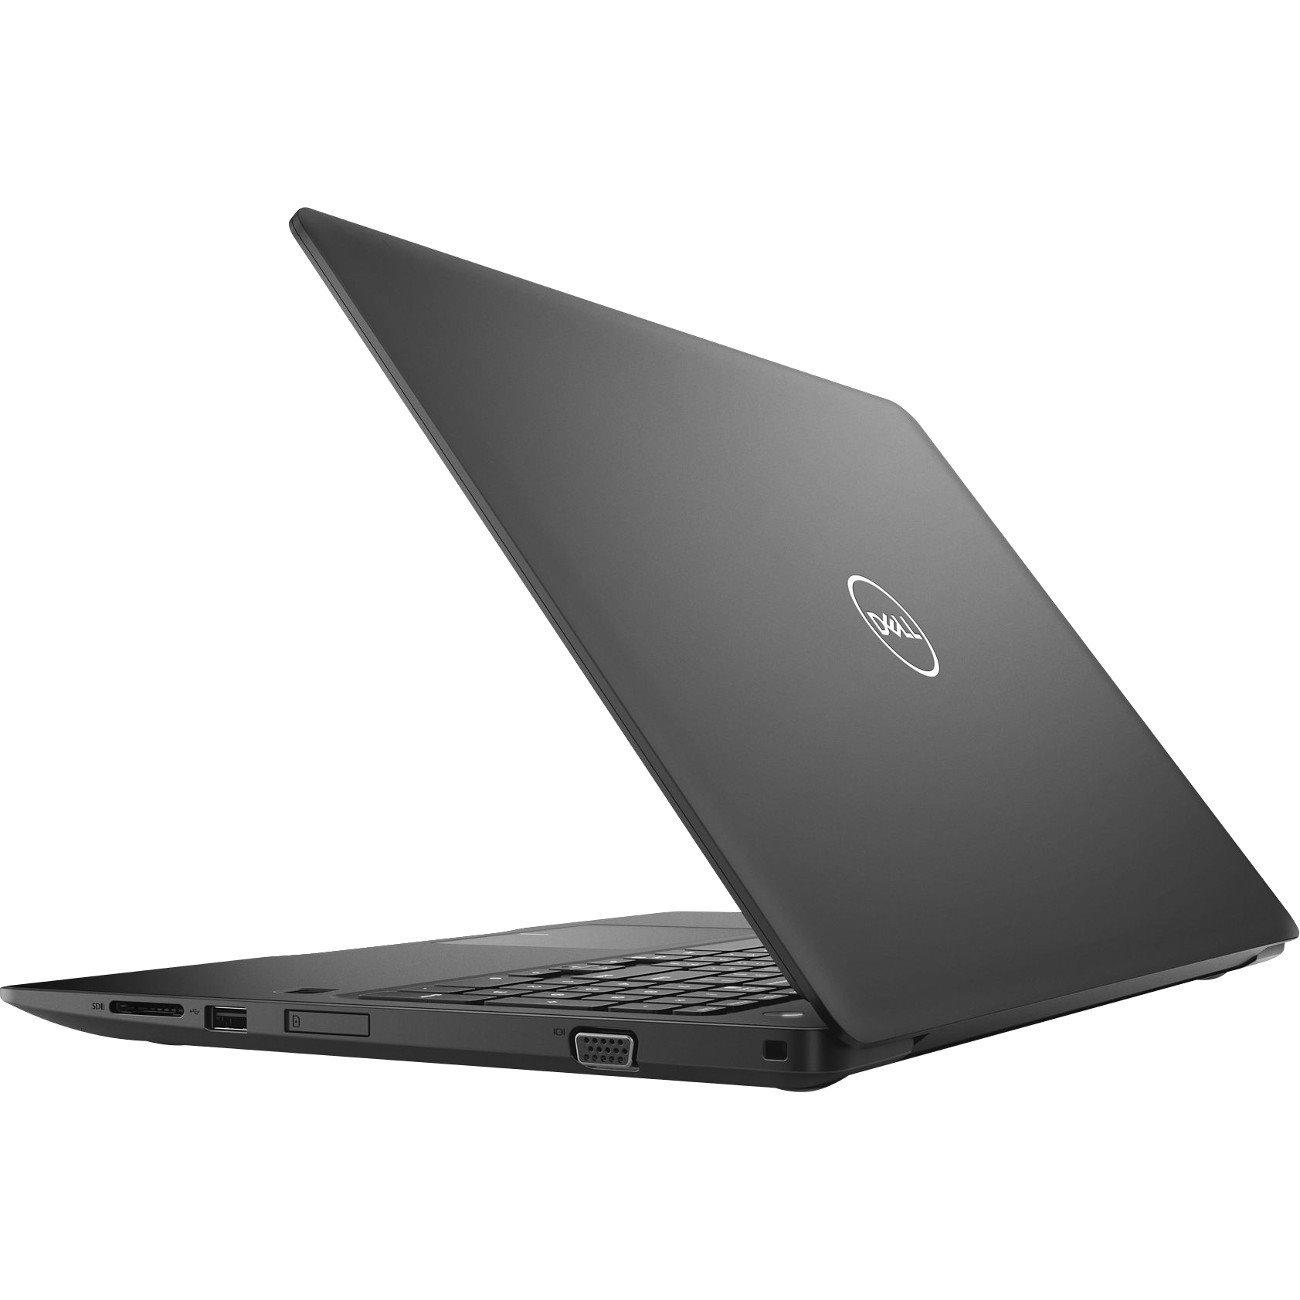 "Dell Latitude 3000 3590 39.6 cm (15.6"") LCD Notebook - Intel Core i5 (8th Gen) i5-8250U Quad-core (4 Core) 1.60 GHz - 8 GB DDR4 SDRAM - 256 GB SSD - Windows 10 Pro 64-bit (English) - 1920 x 1080"